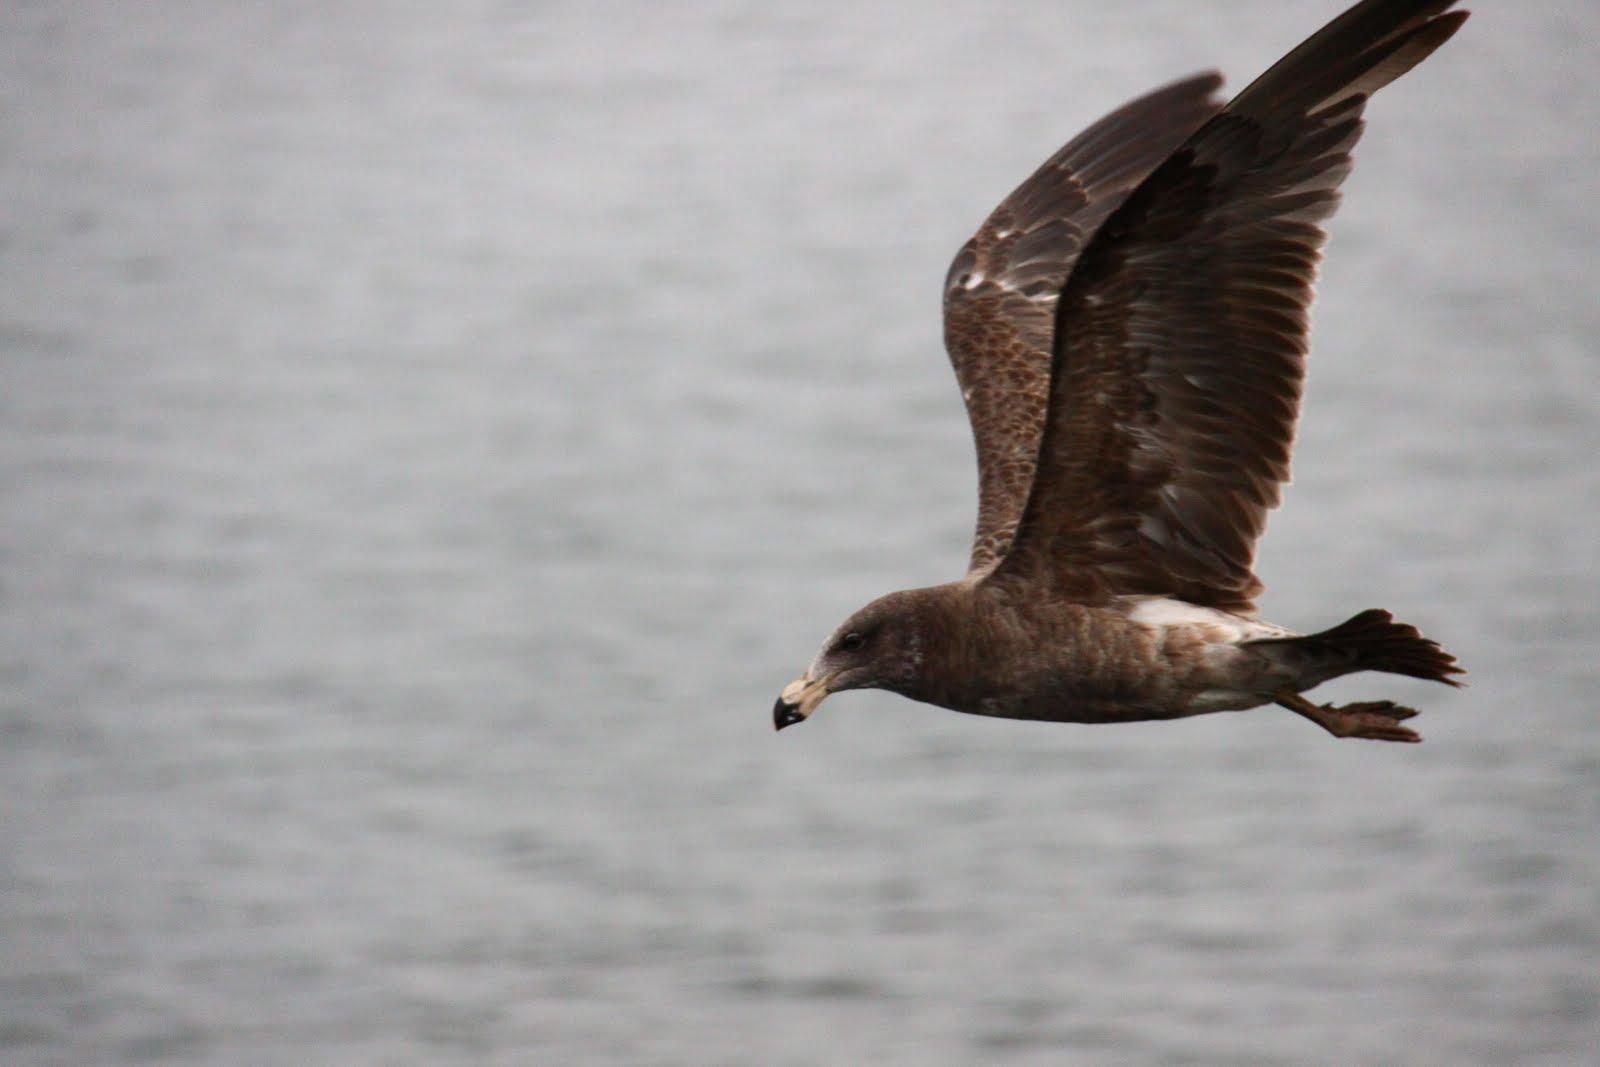 ViSiON of eArTH Terbang Bebas